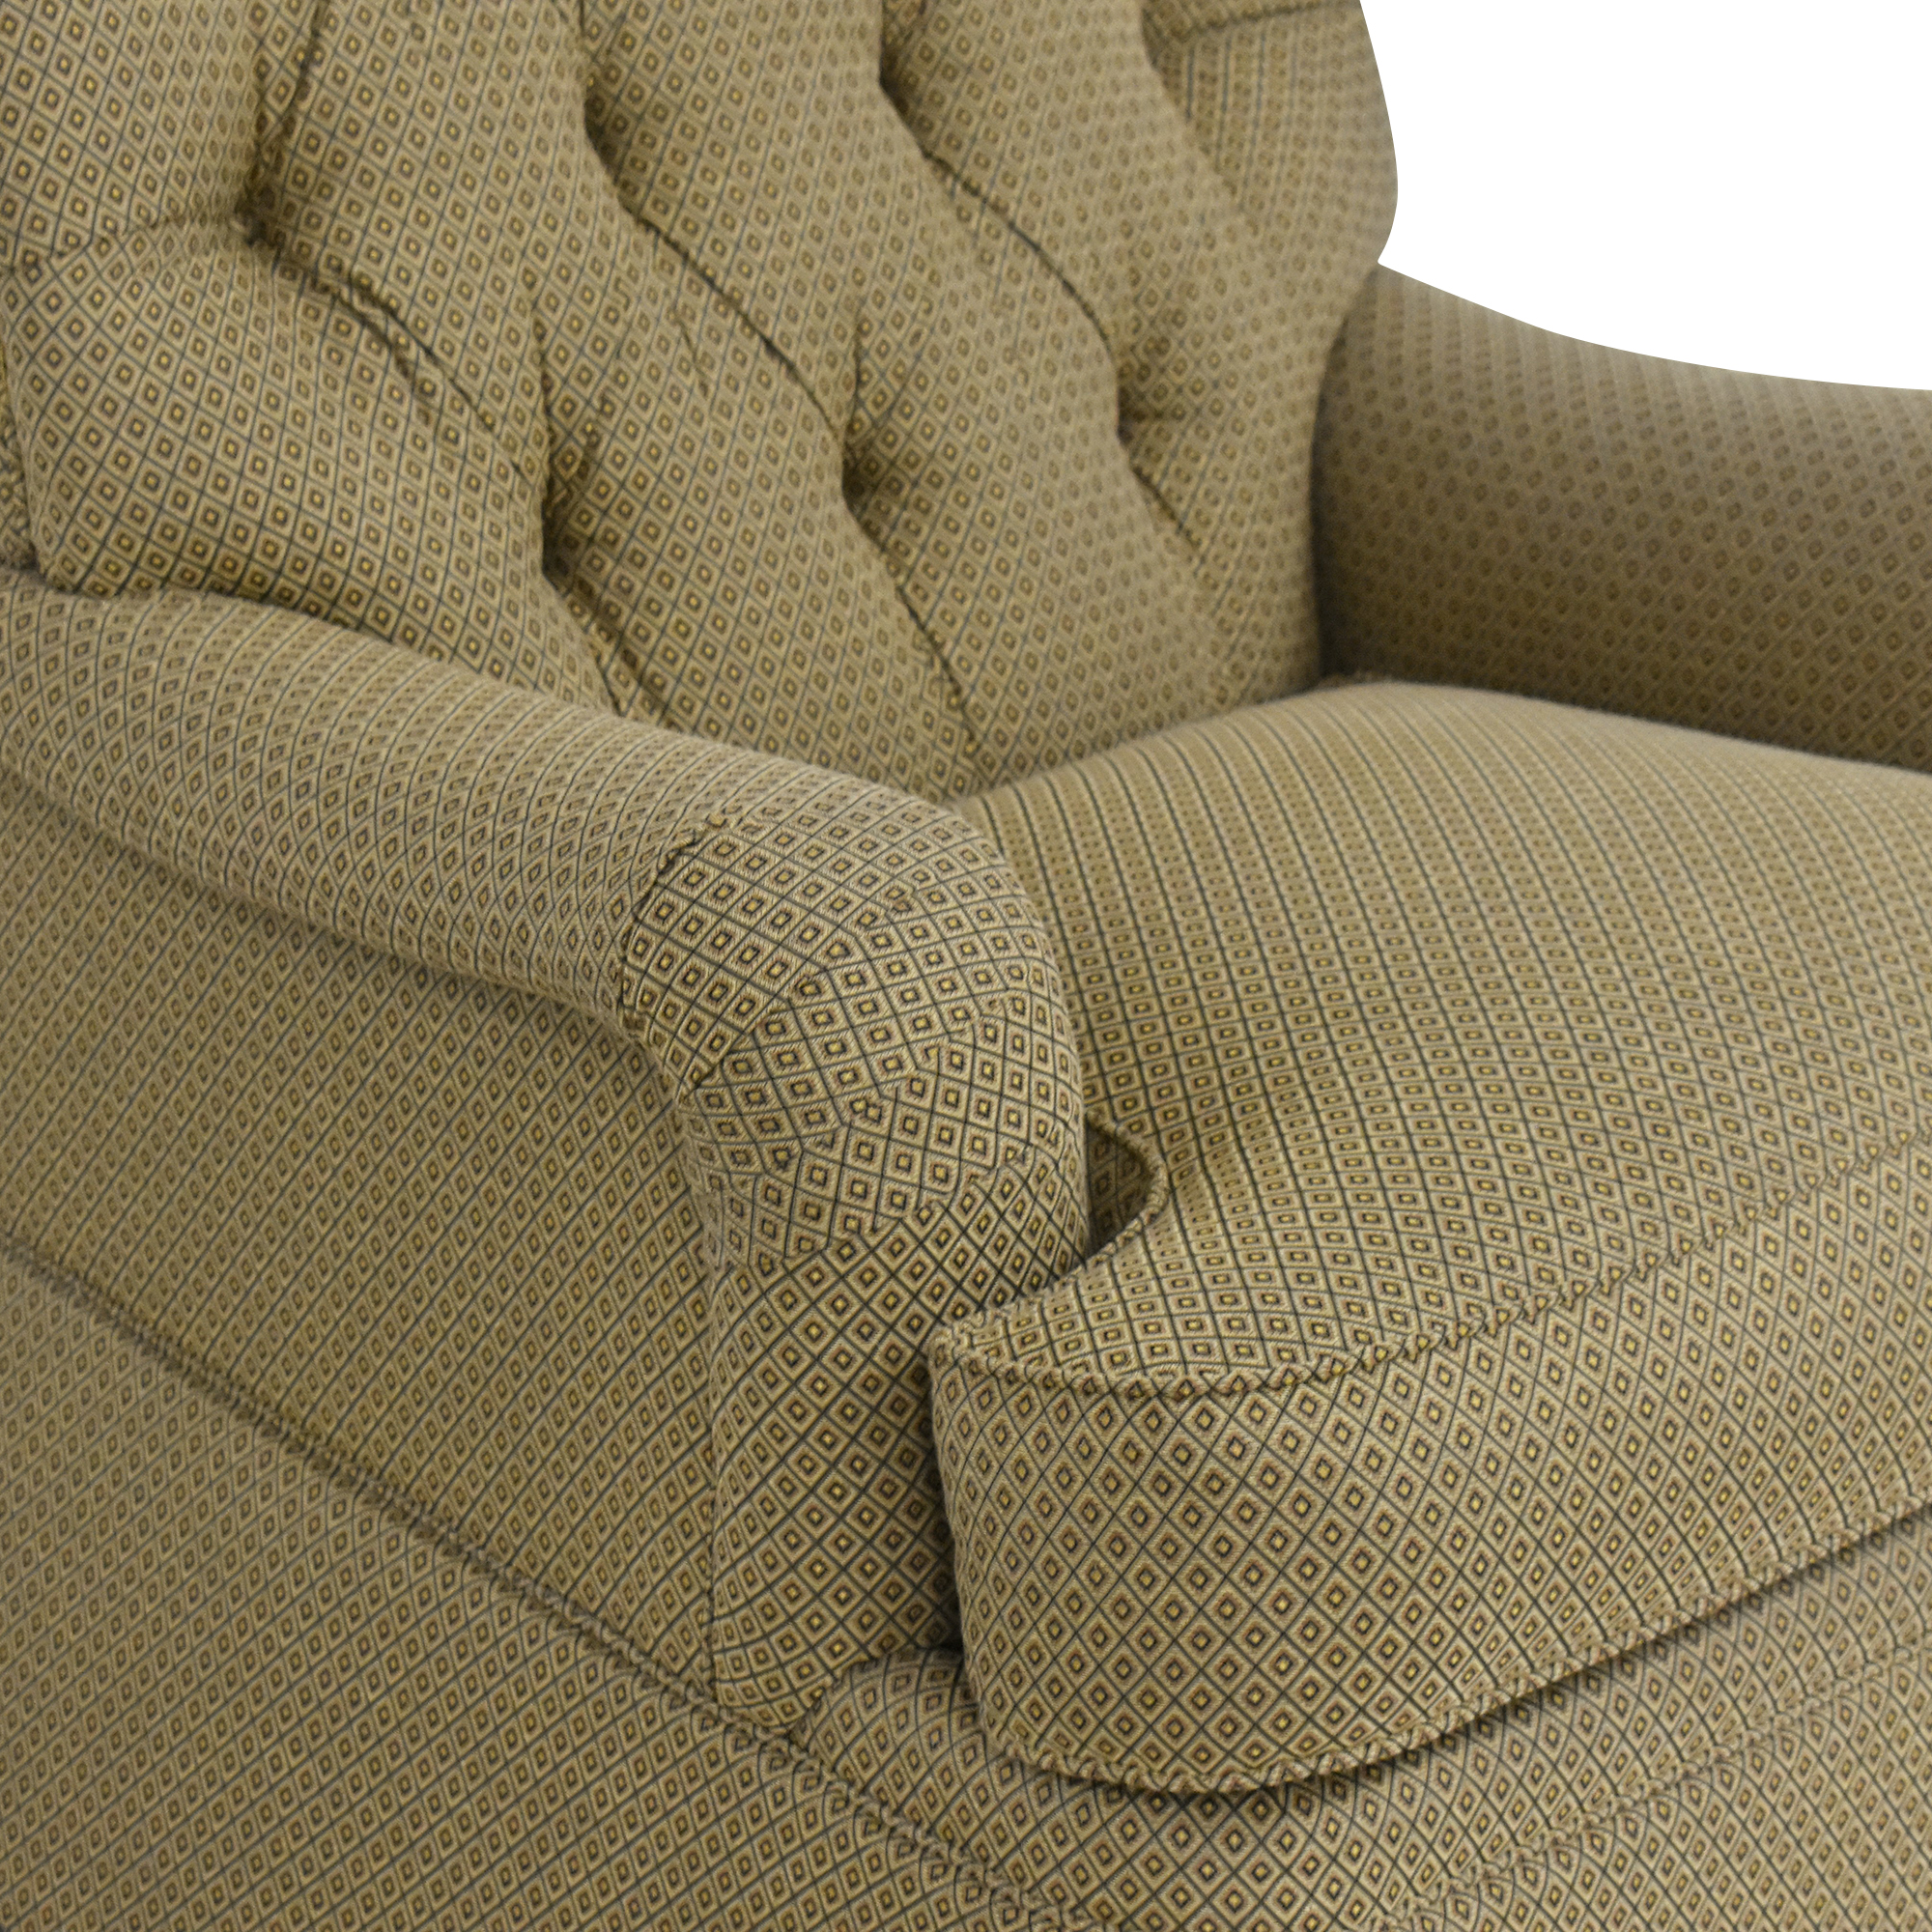 shop Henredon Furniture Scroll Back Accent Chair Henredon Furniture Chairs